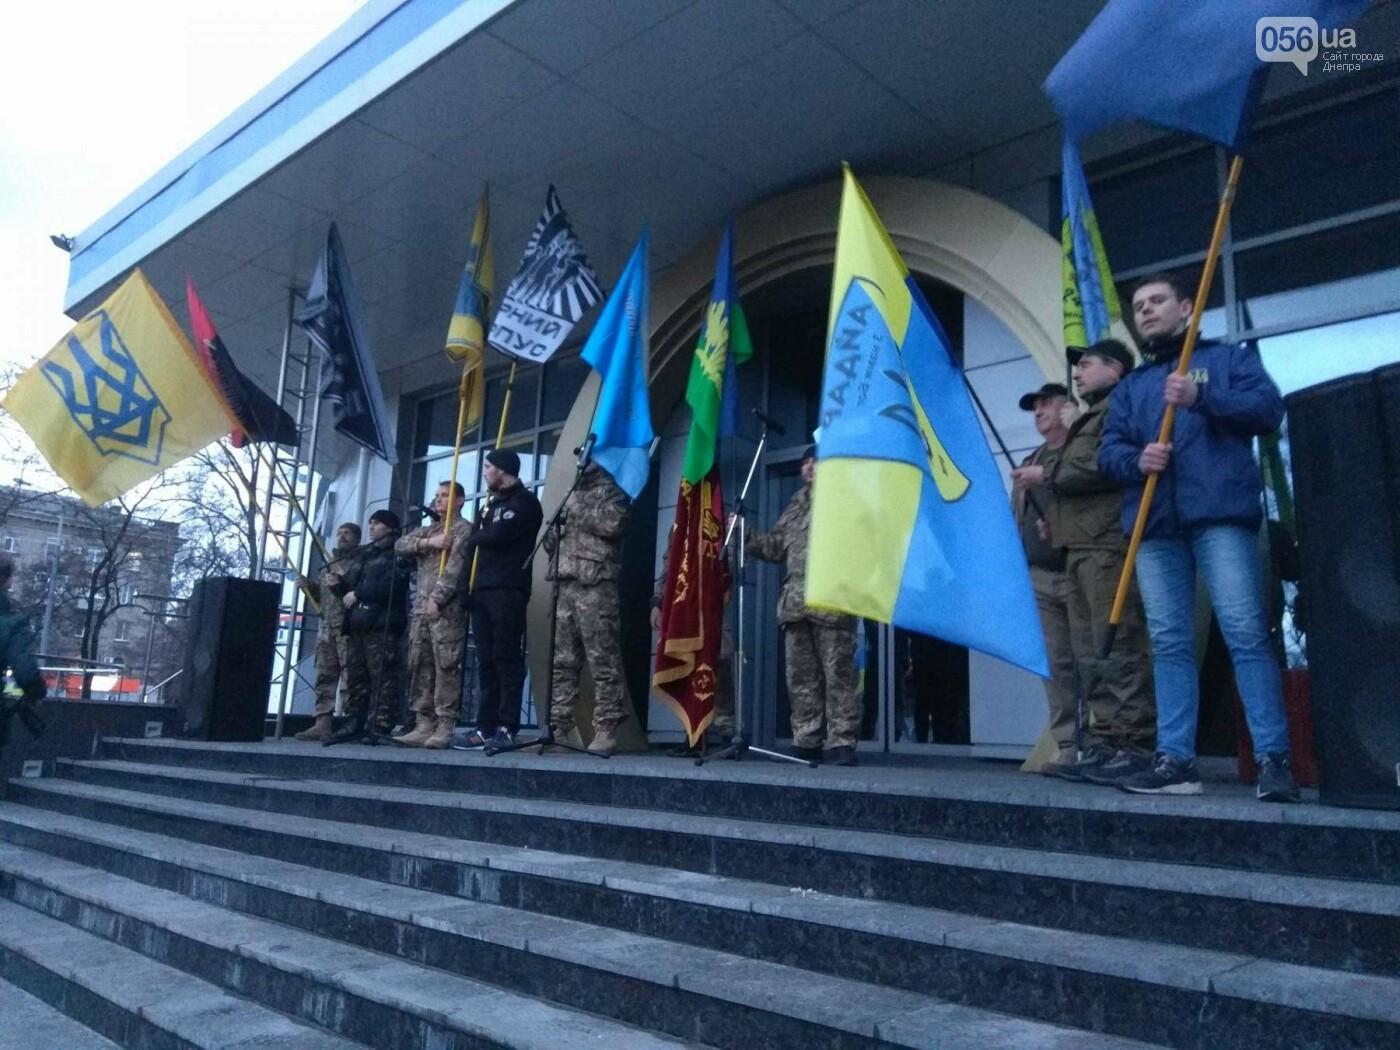 В центре Днепра прошла колонна добровольцев АТО (ФОТО, ВИДЕО), фото-8